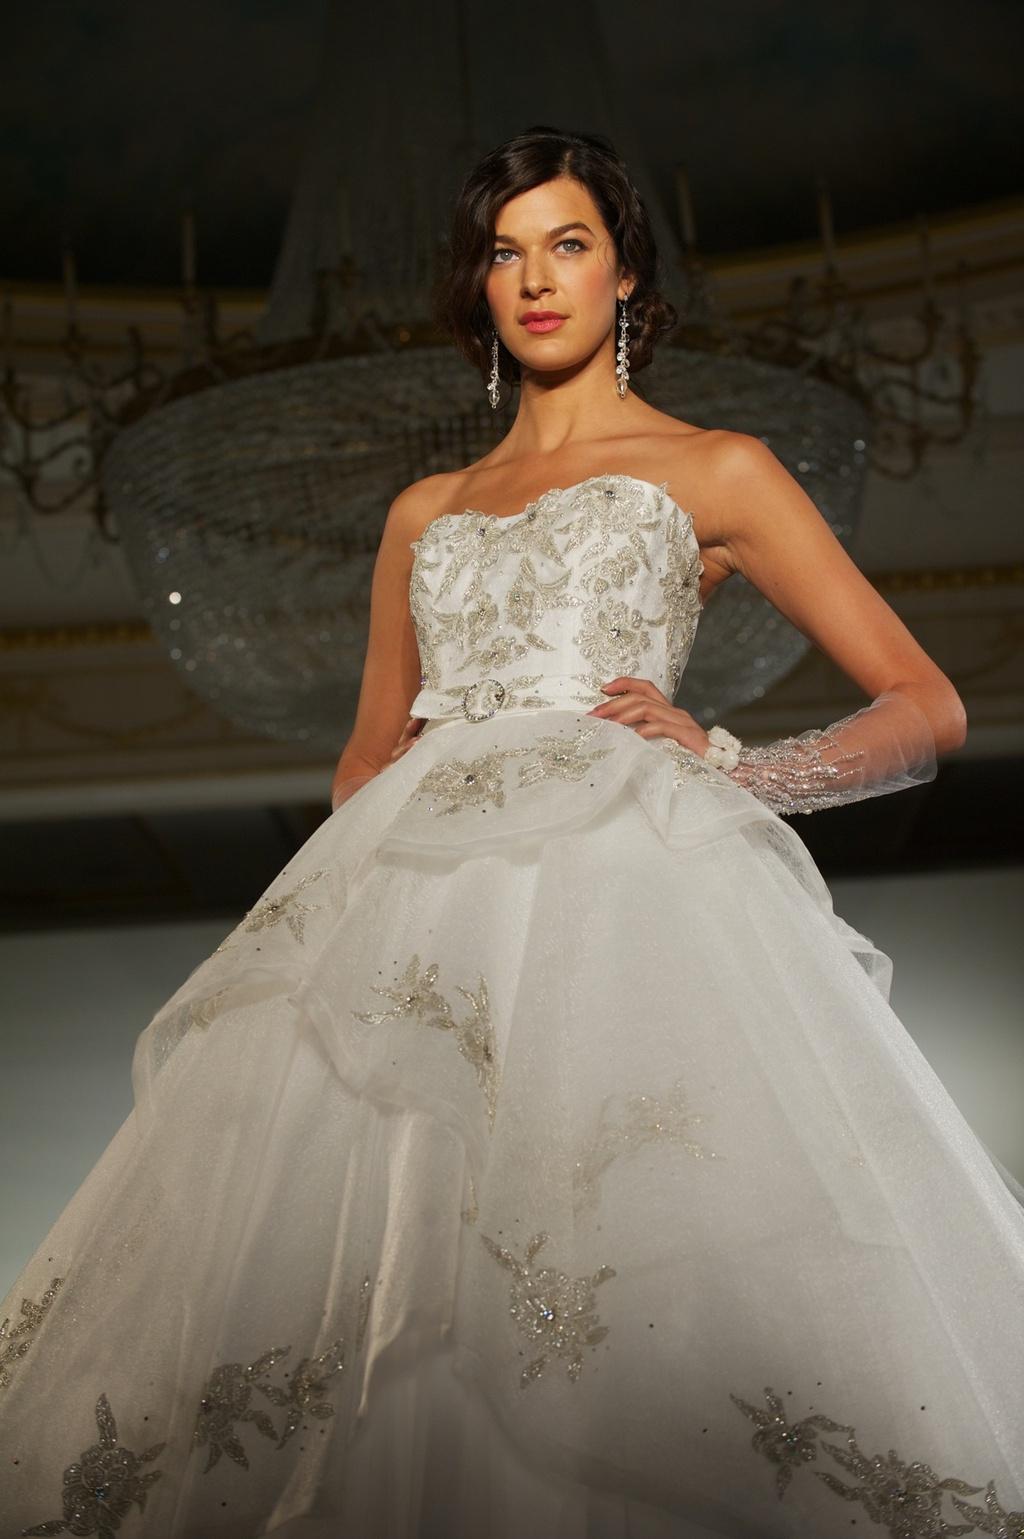 Ines-di-santo-wedding-dress-2012-bridal-gowns-25.full